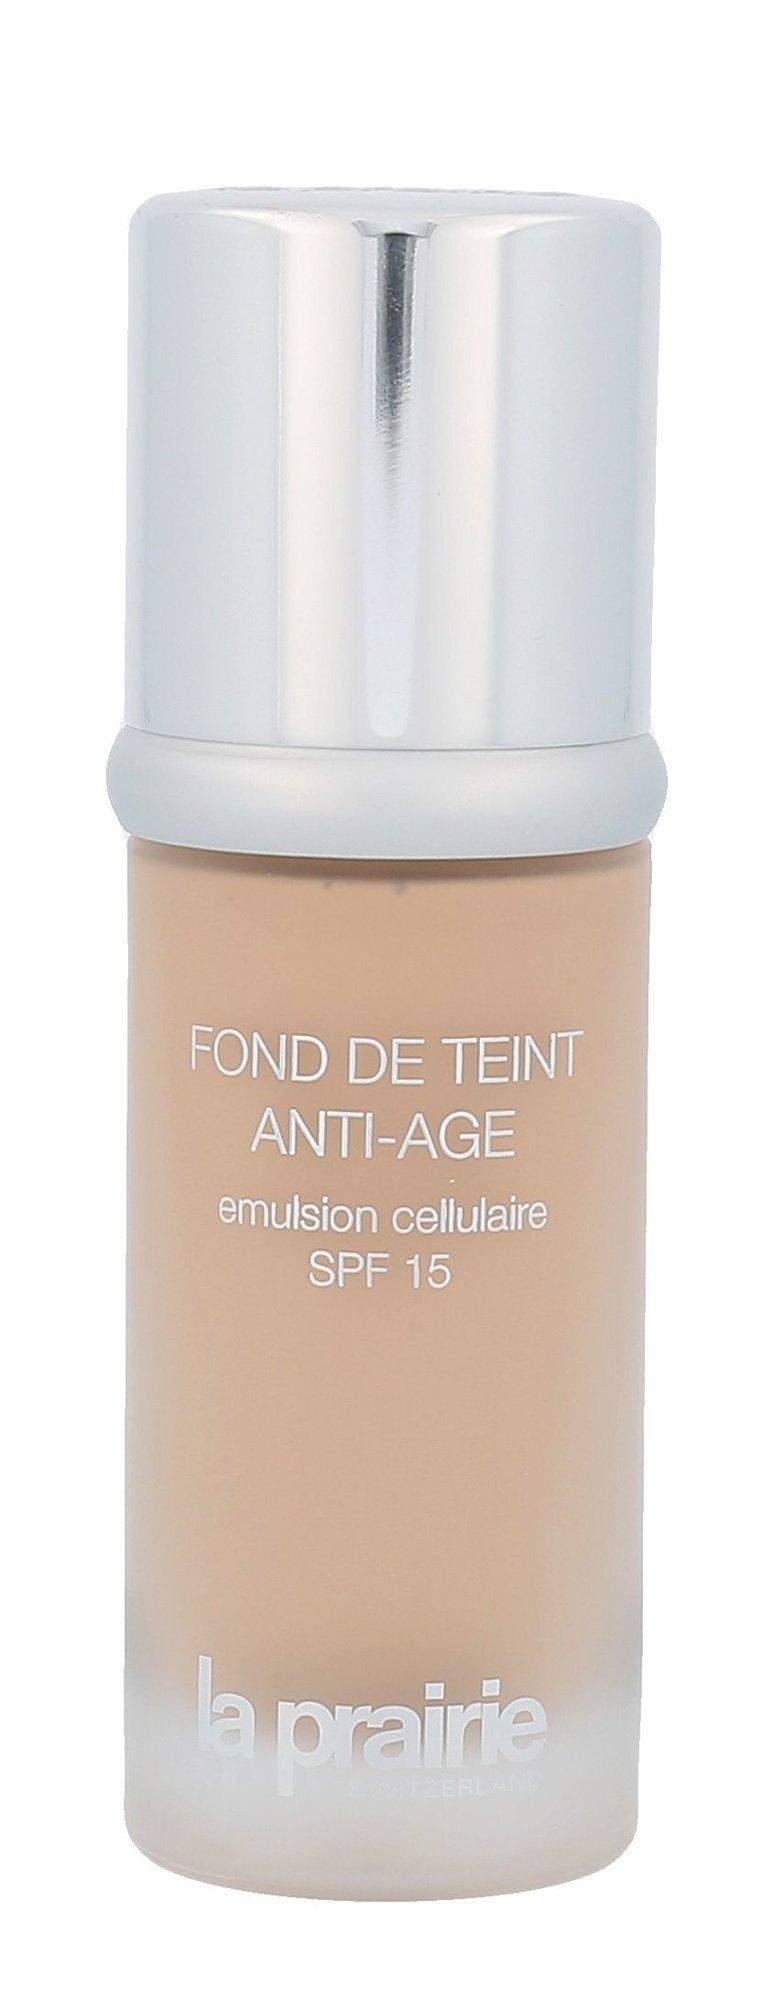 La Prairie Anti Aging Foundation SPF15 Cosmetic 30ml Shade 200